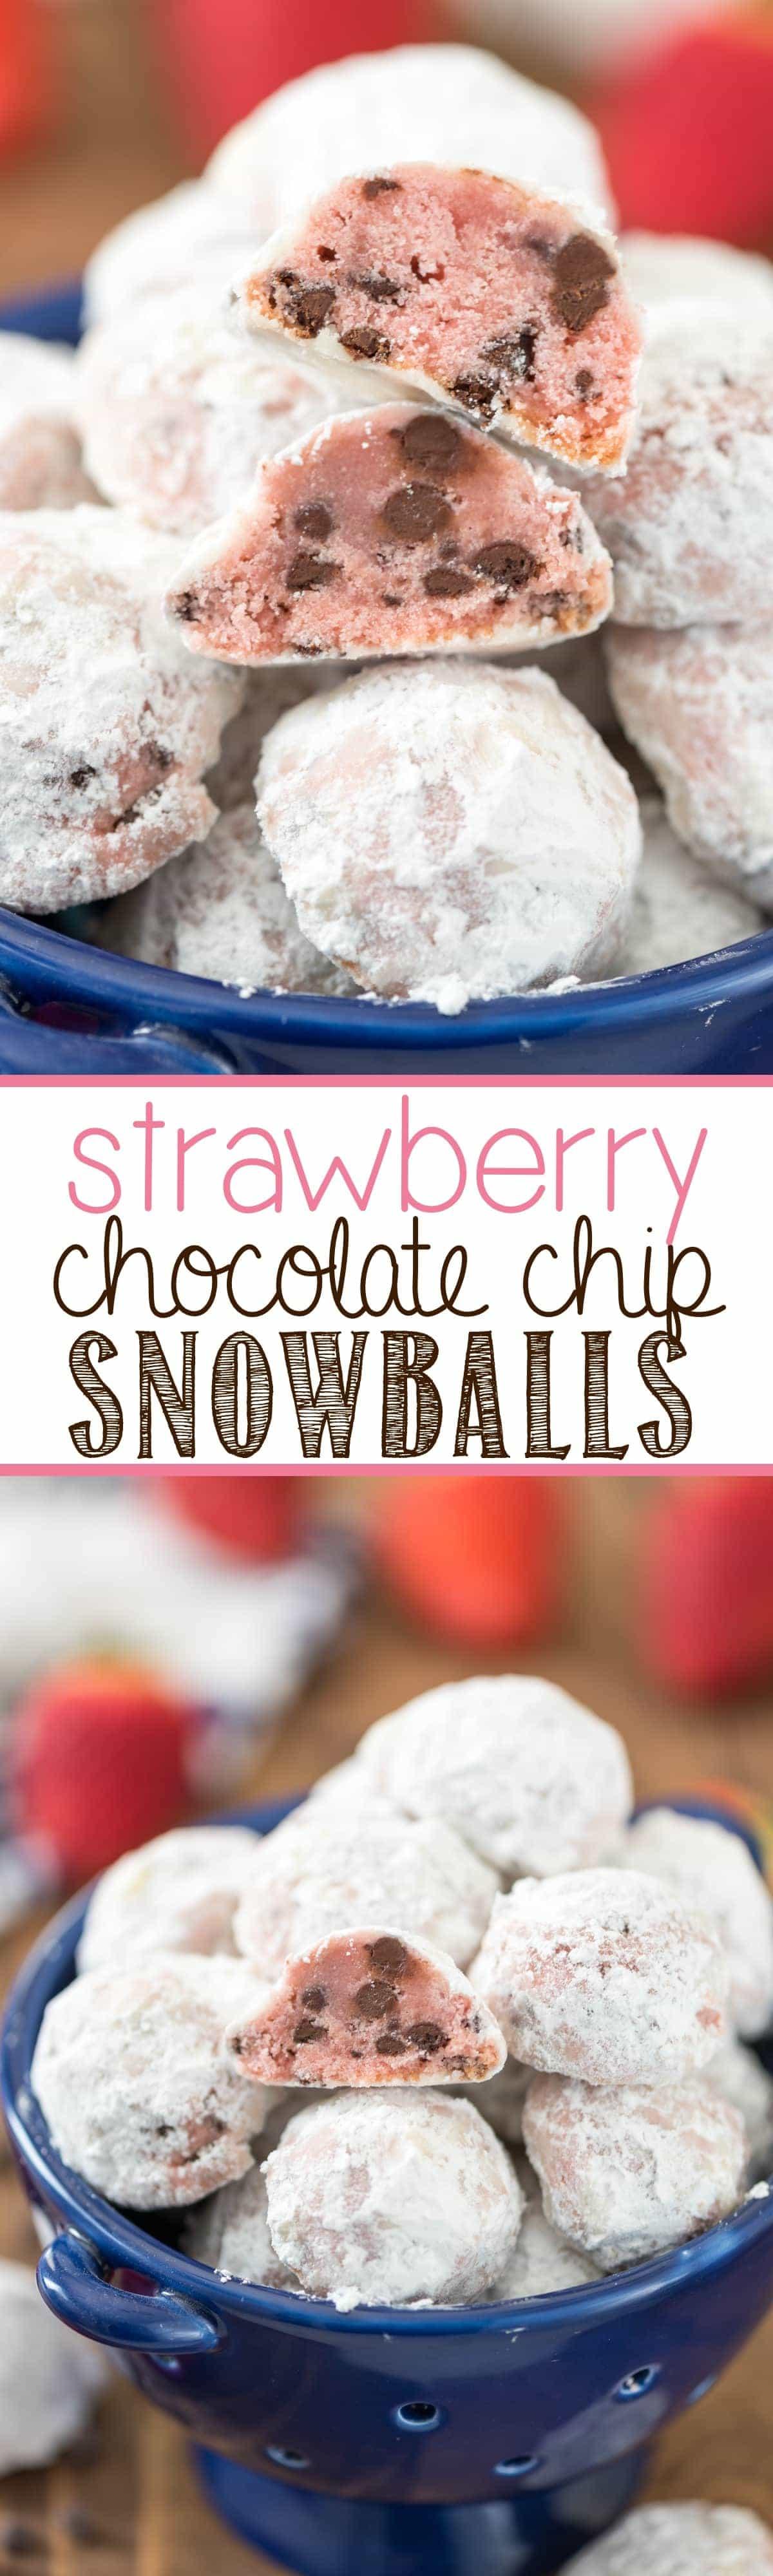 Strawberry snowball cake recipe